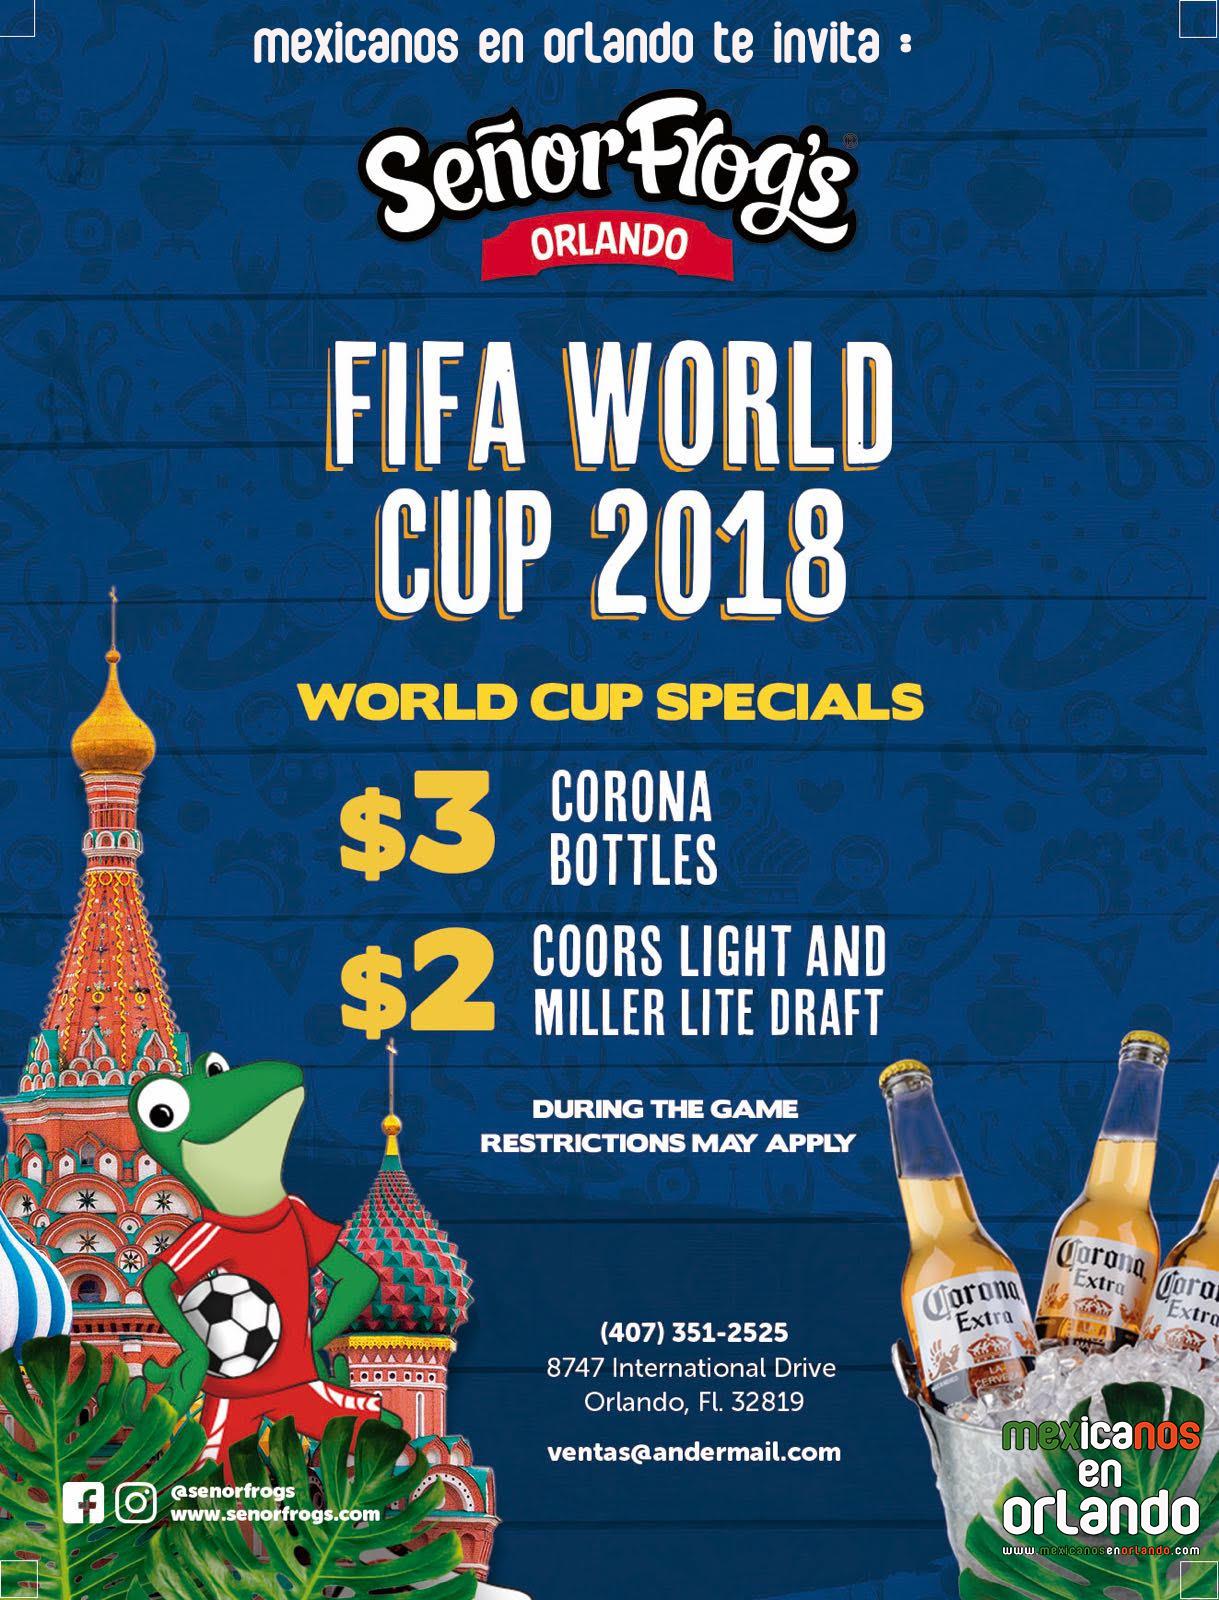 mexicanos en orlando senor frogs mexico world cup